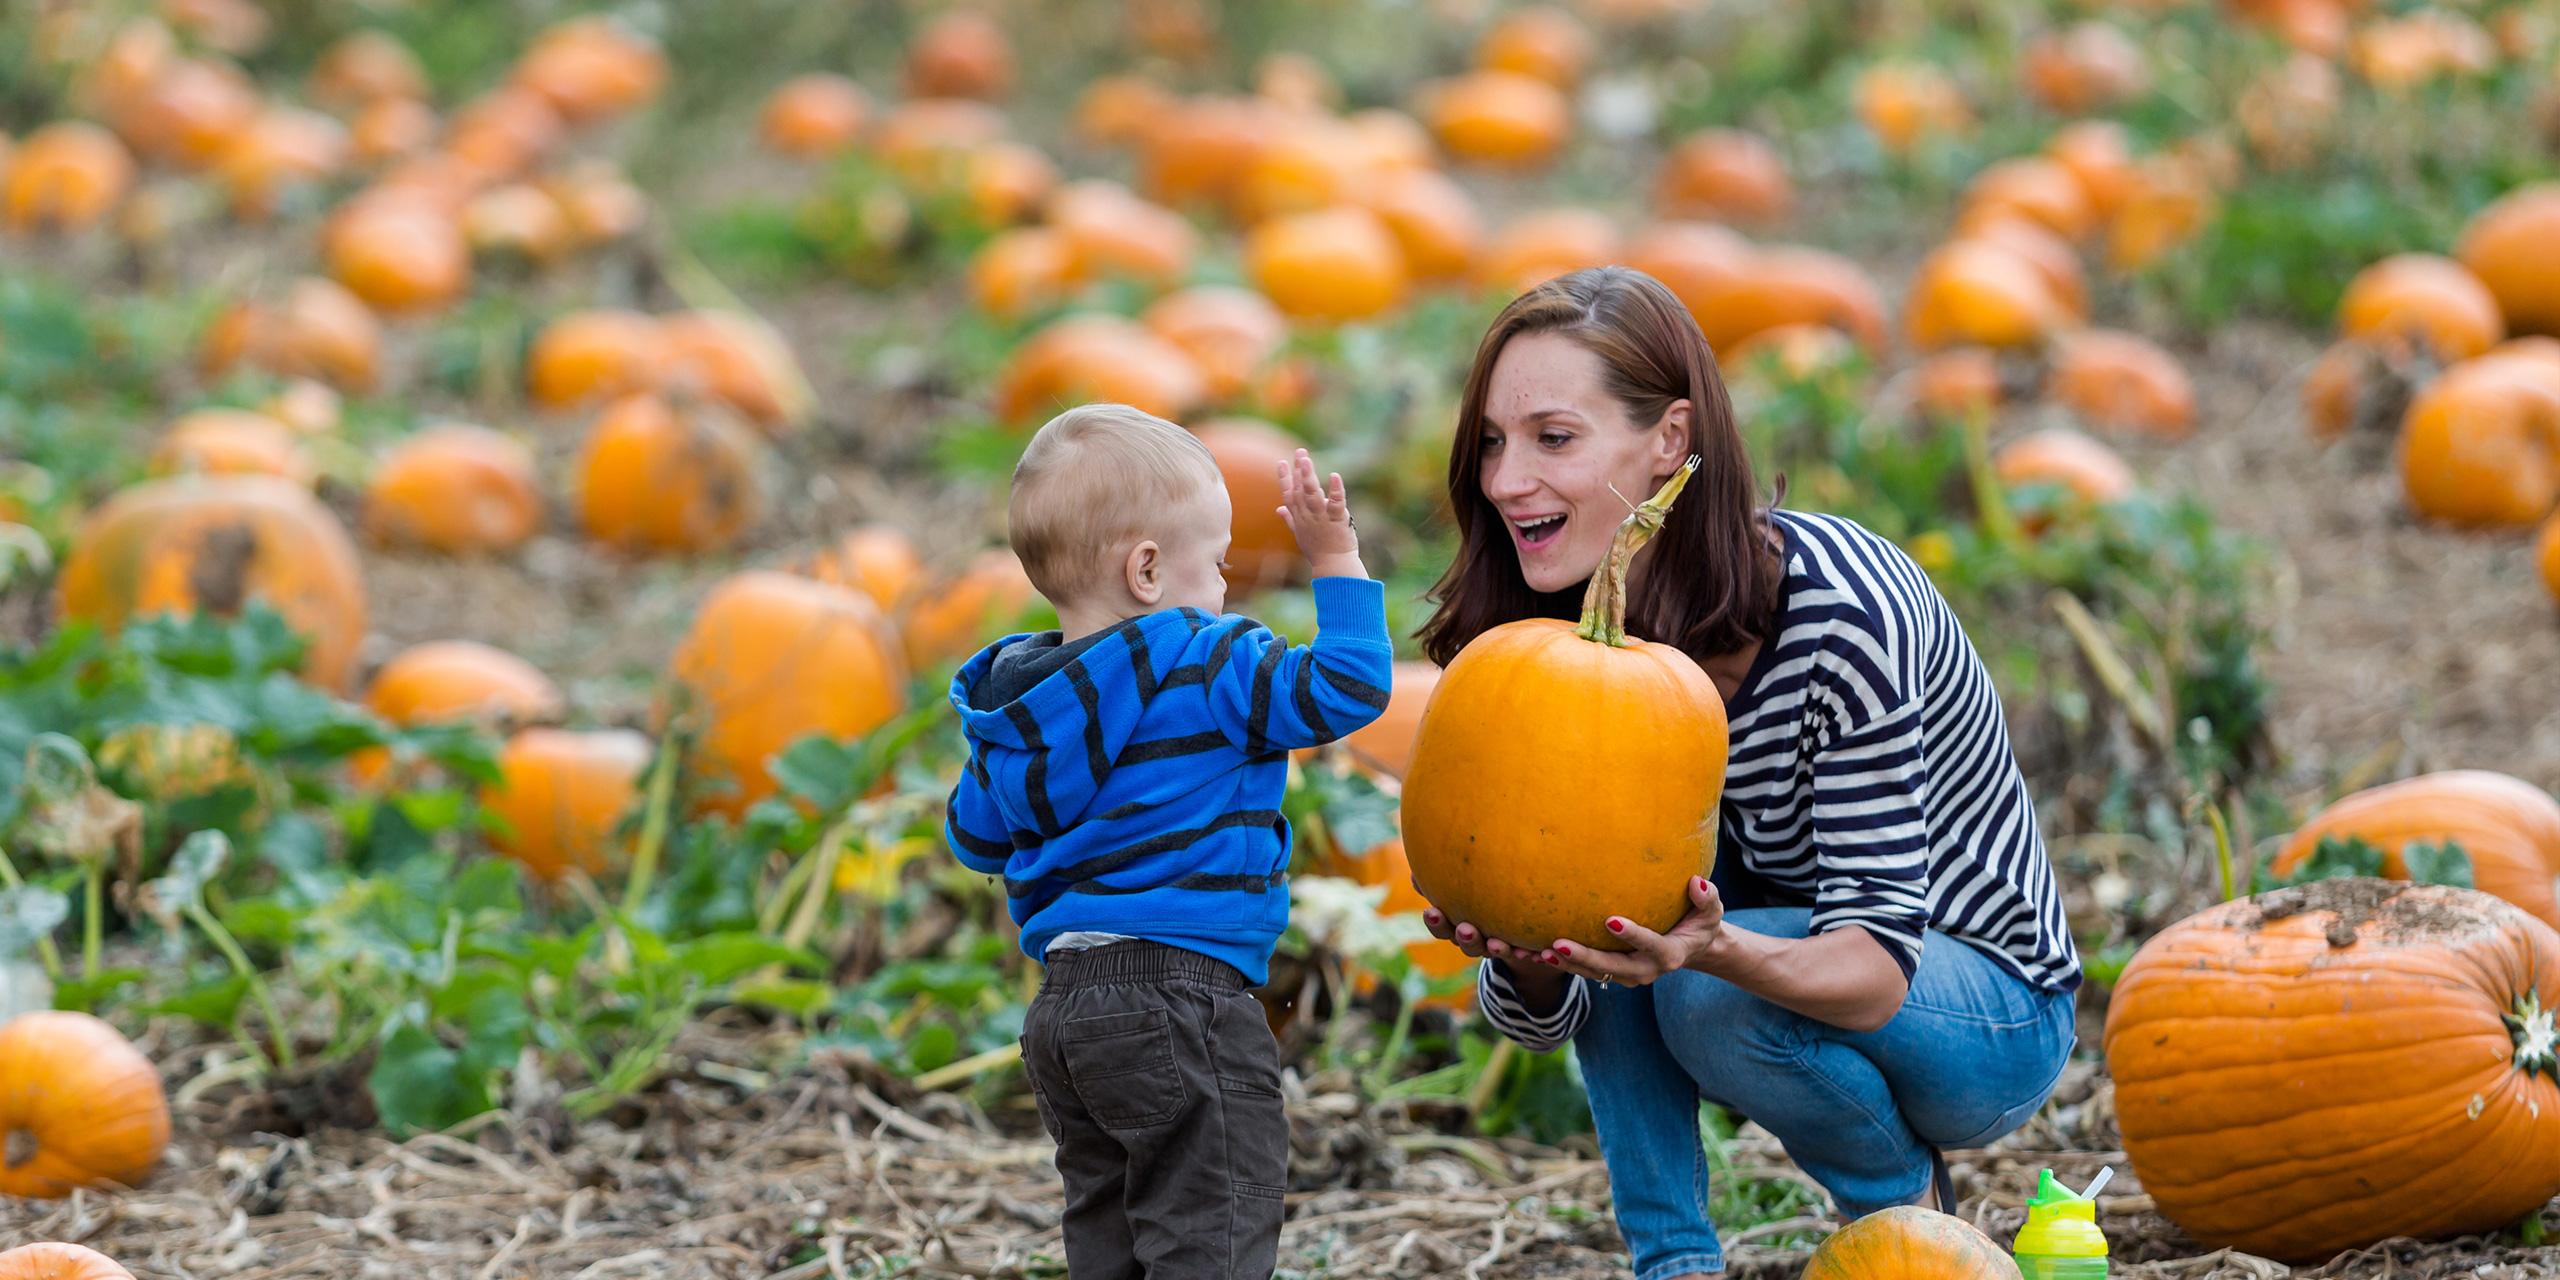 Choosing a pumpkin at a pumpkin patch on Fall day. ; Courtesy of Arina P Habich /Shutterstock